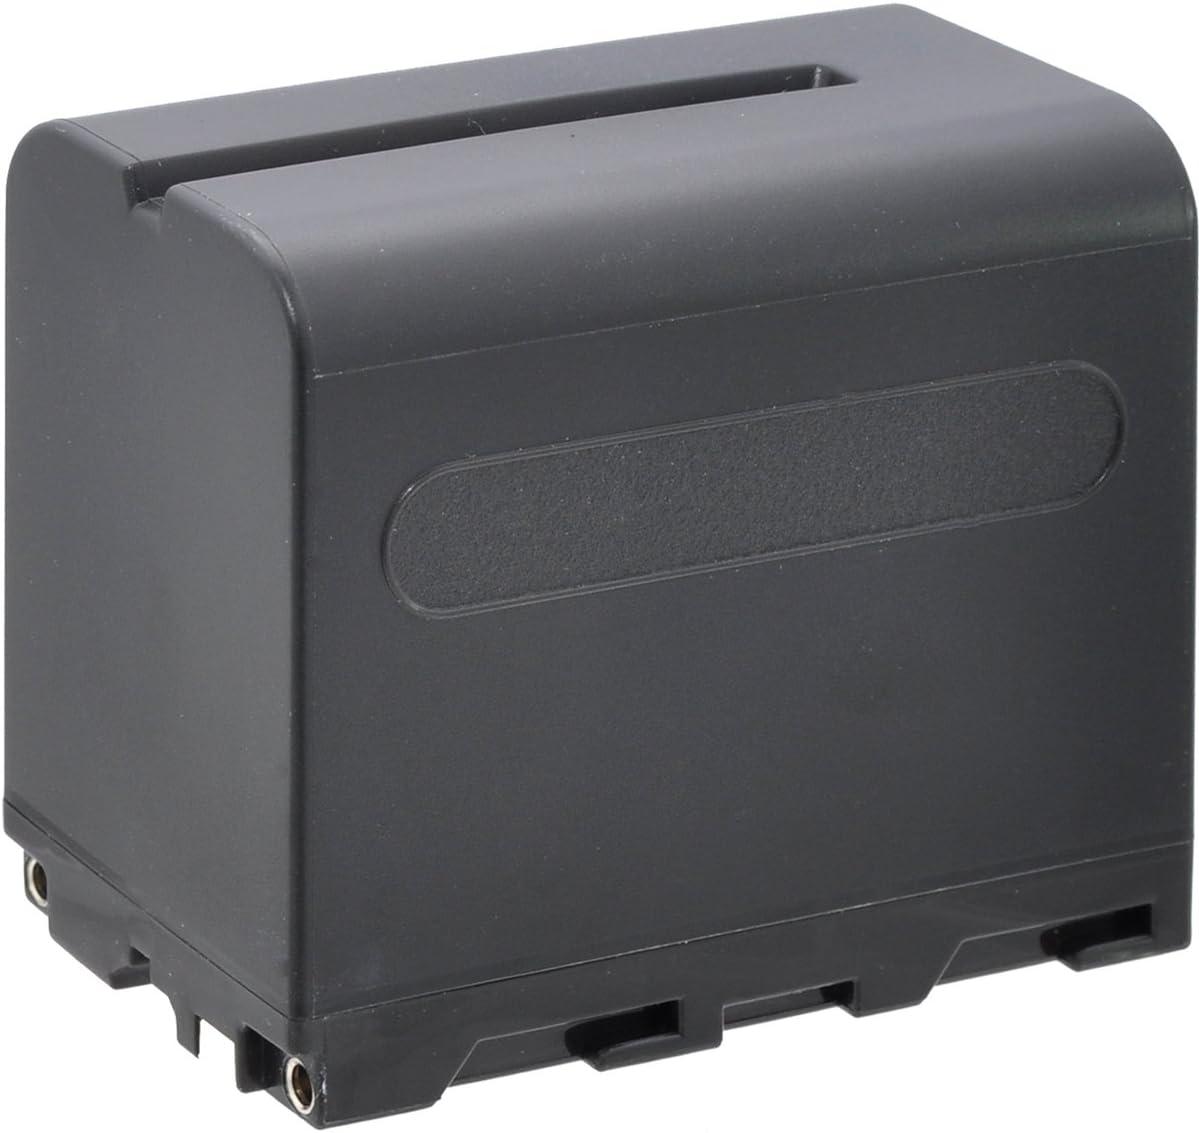 Xit XTNPF975 7800mAh Lithium Ion Replacement Battery for Sony NPF975 (Black)